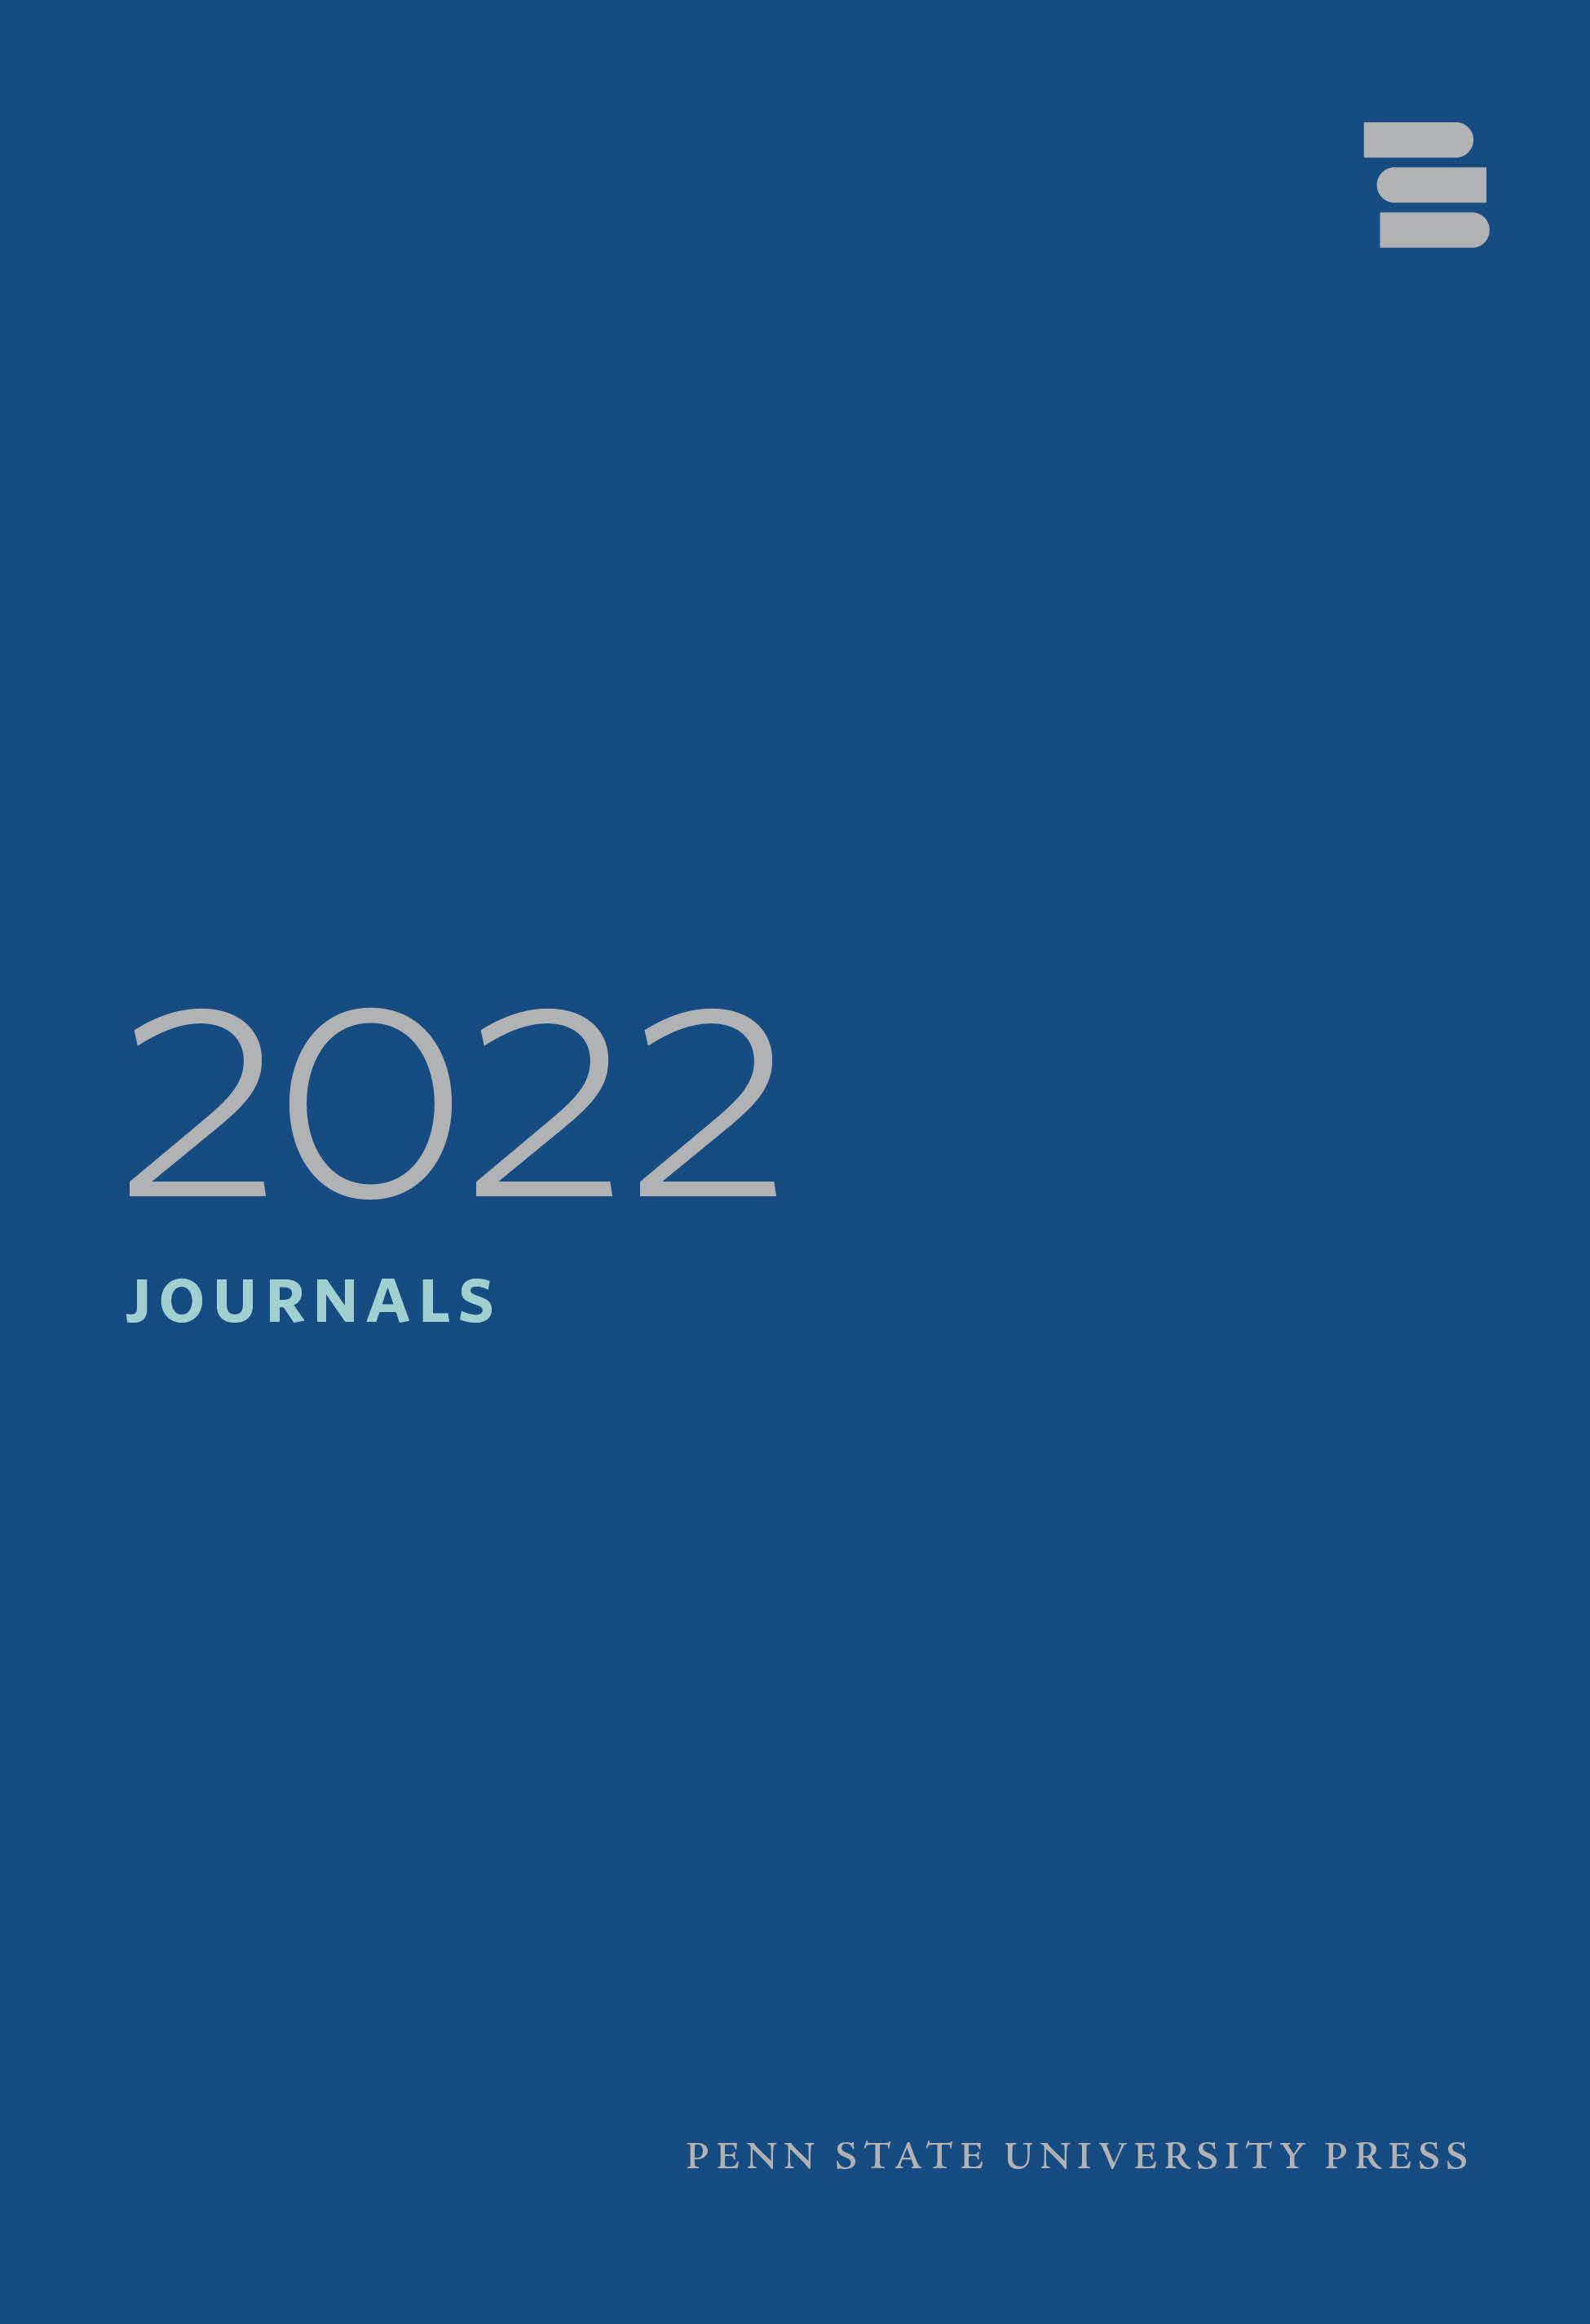 Cover for PSU Press Journals Catalog 2022